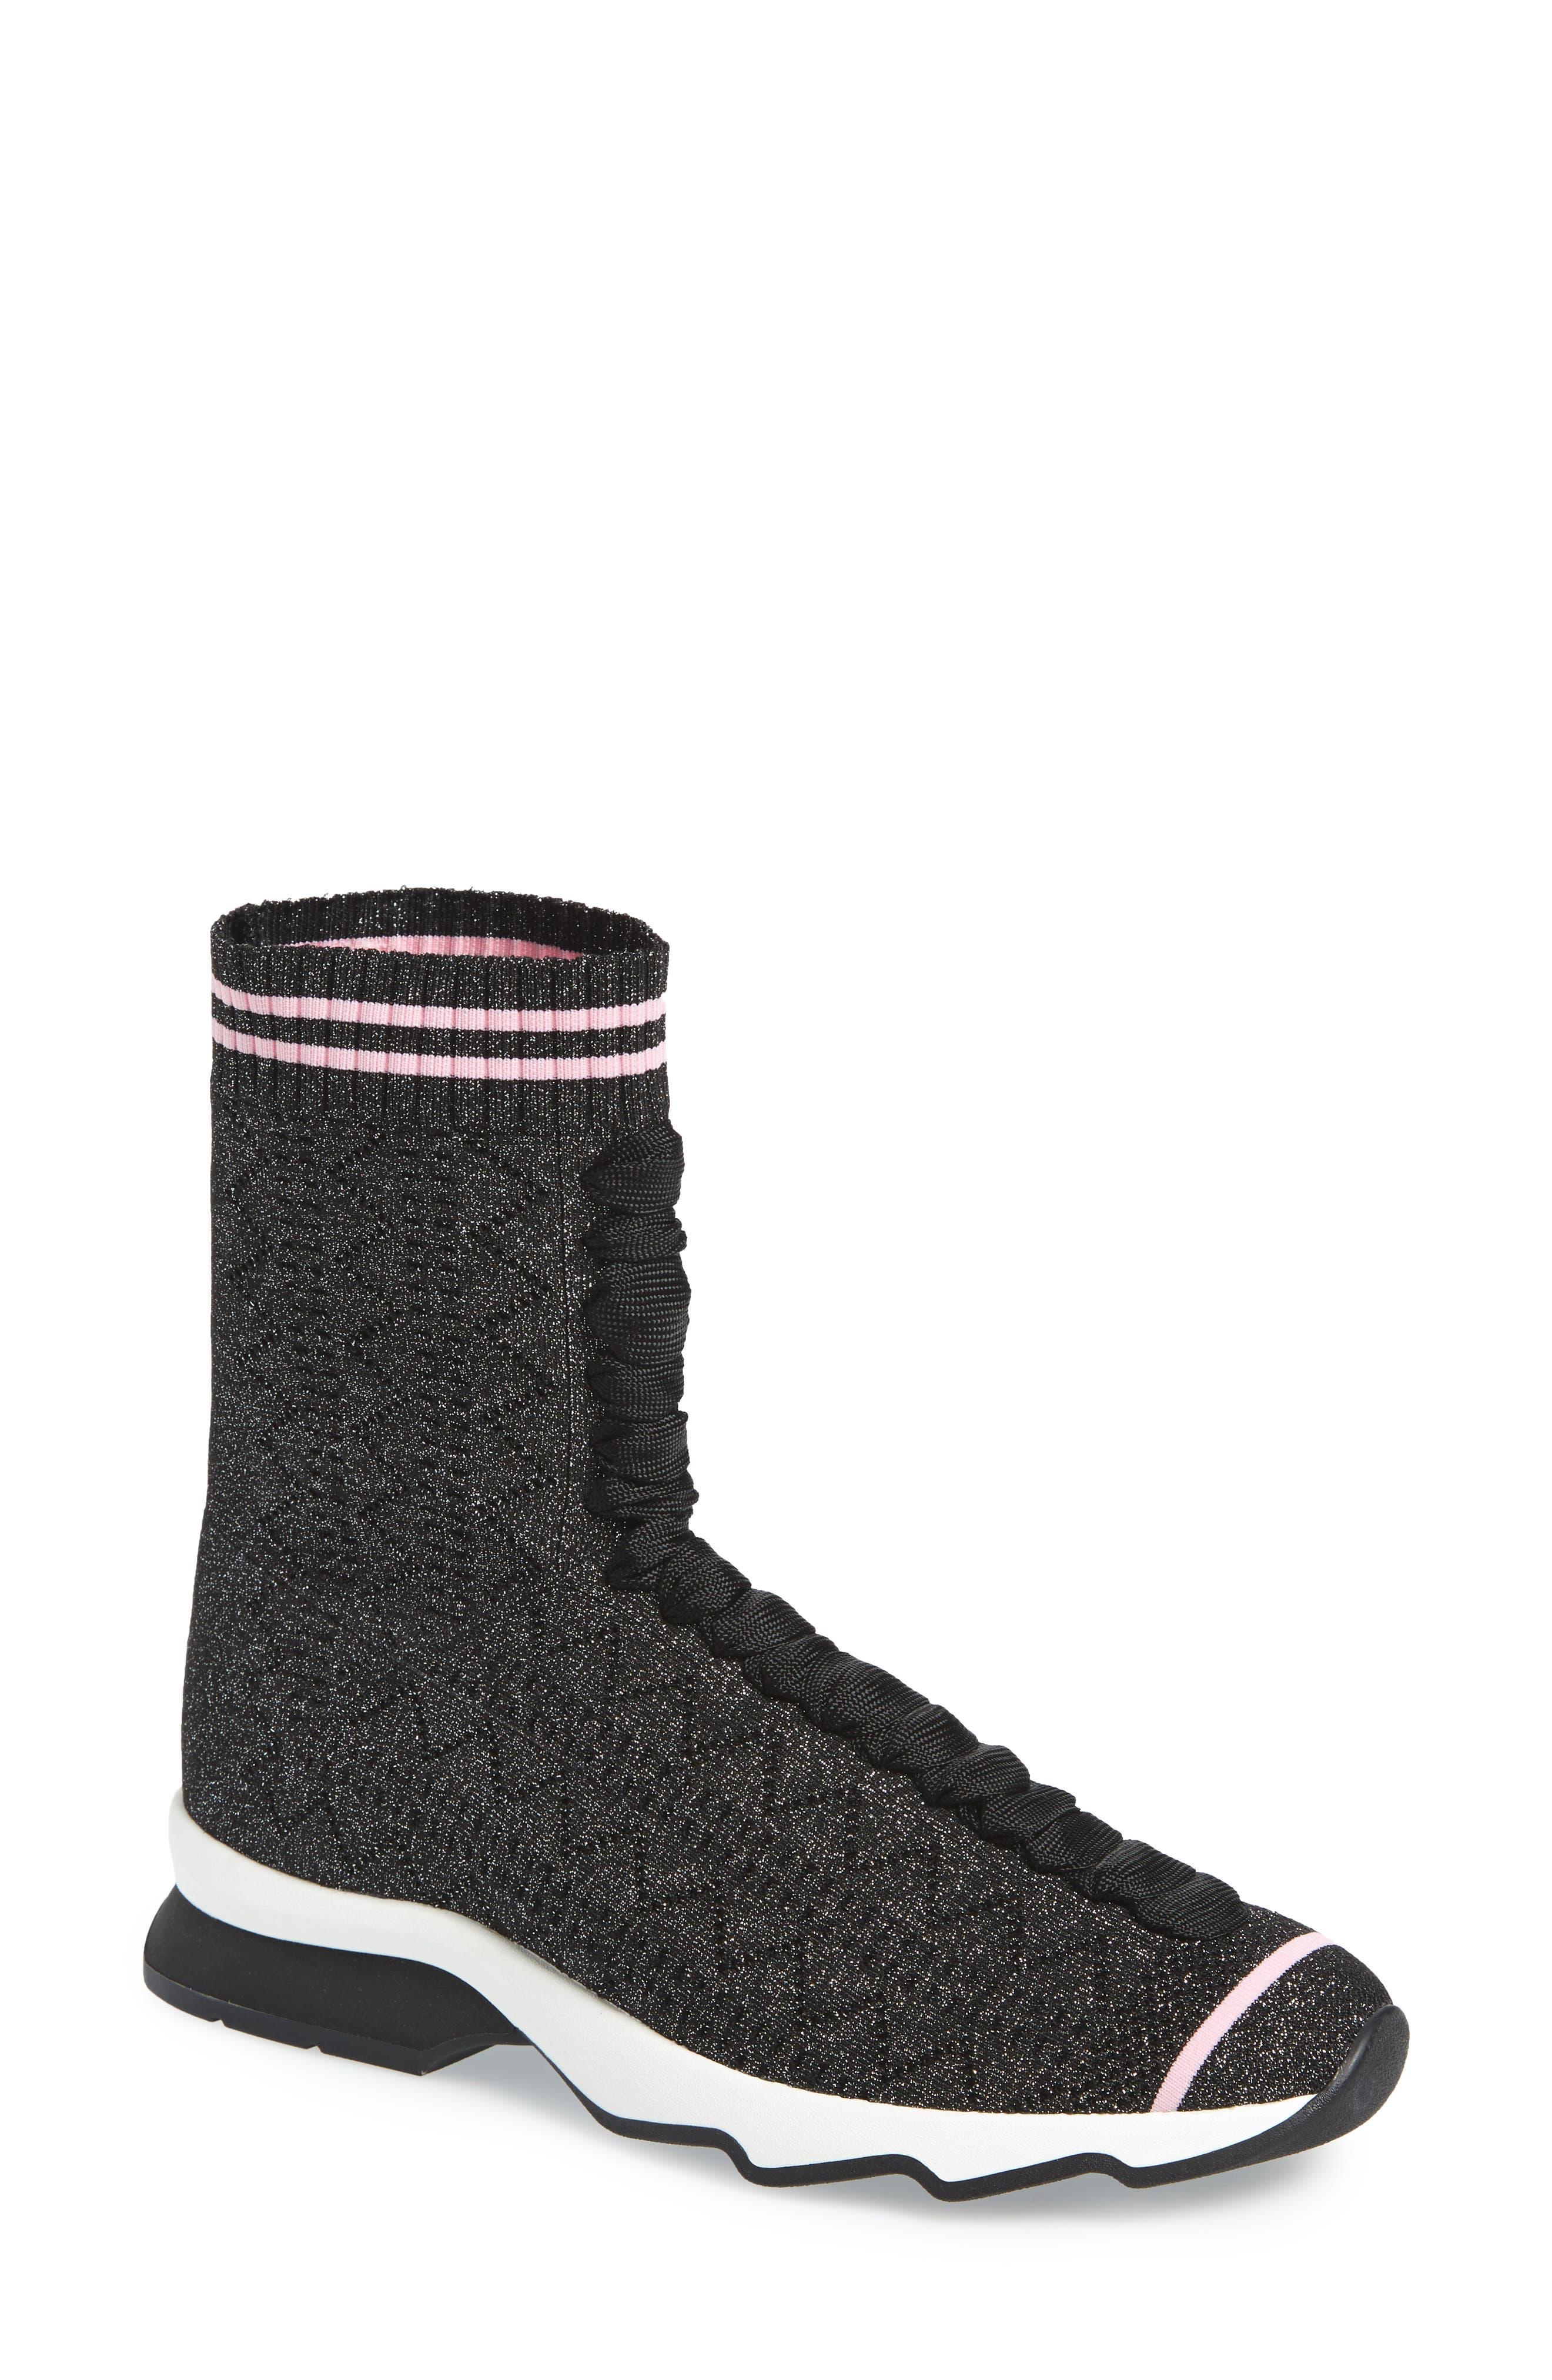 Alternate Image 1 Selected - Fendi Rockoko High Top Sock Sneaker (Women)